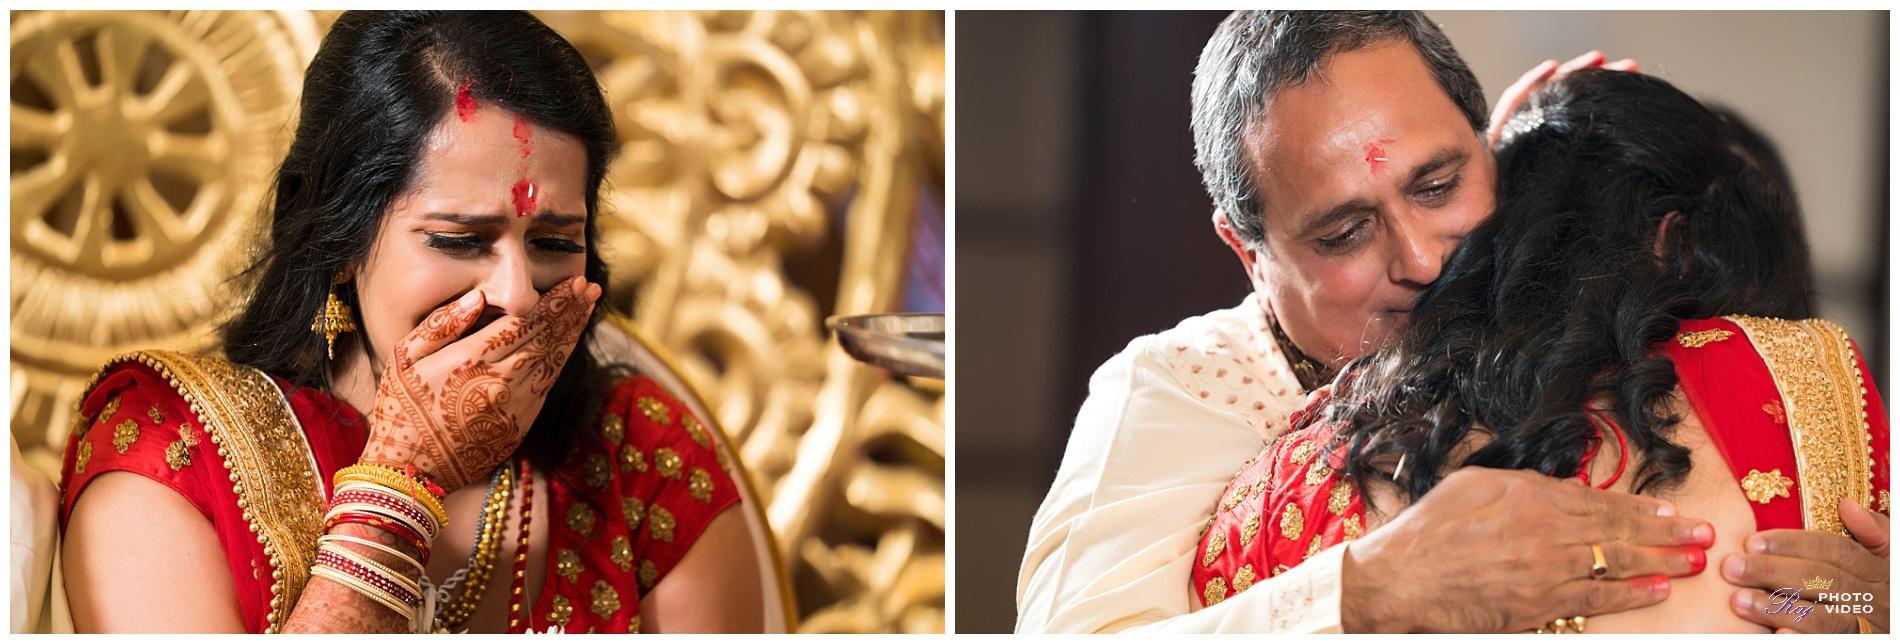 Martinsville-Gardens-NJ-Indian-Wedding-Ruchi-Vishal-35.jpg